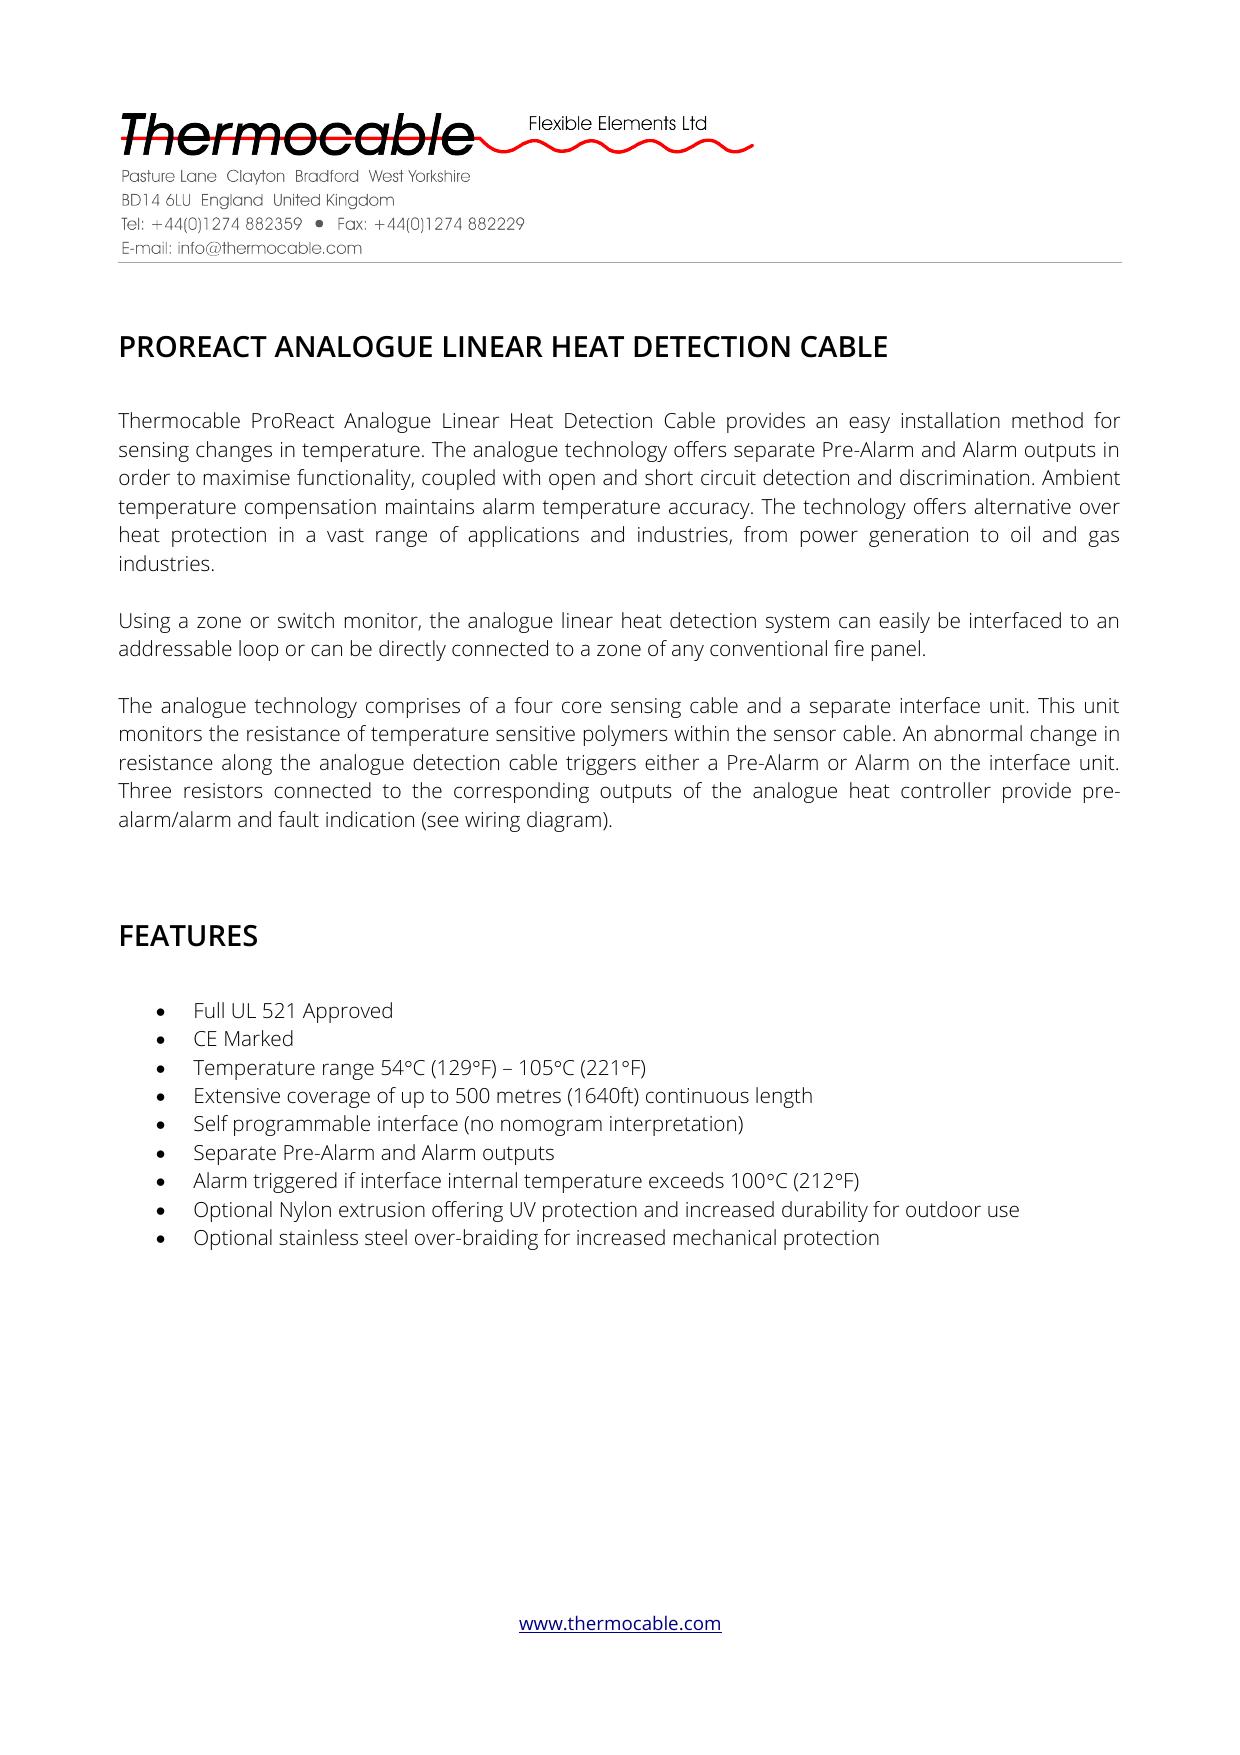 ProReact Analogue Linear Heat Detection System Datasheet | manualzz.com